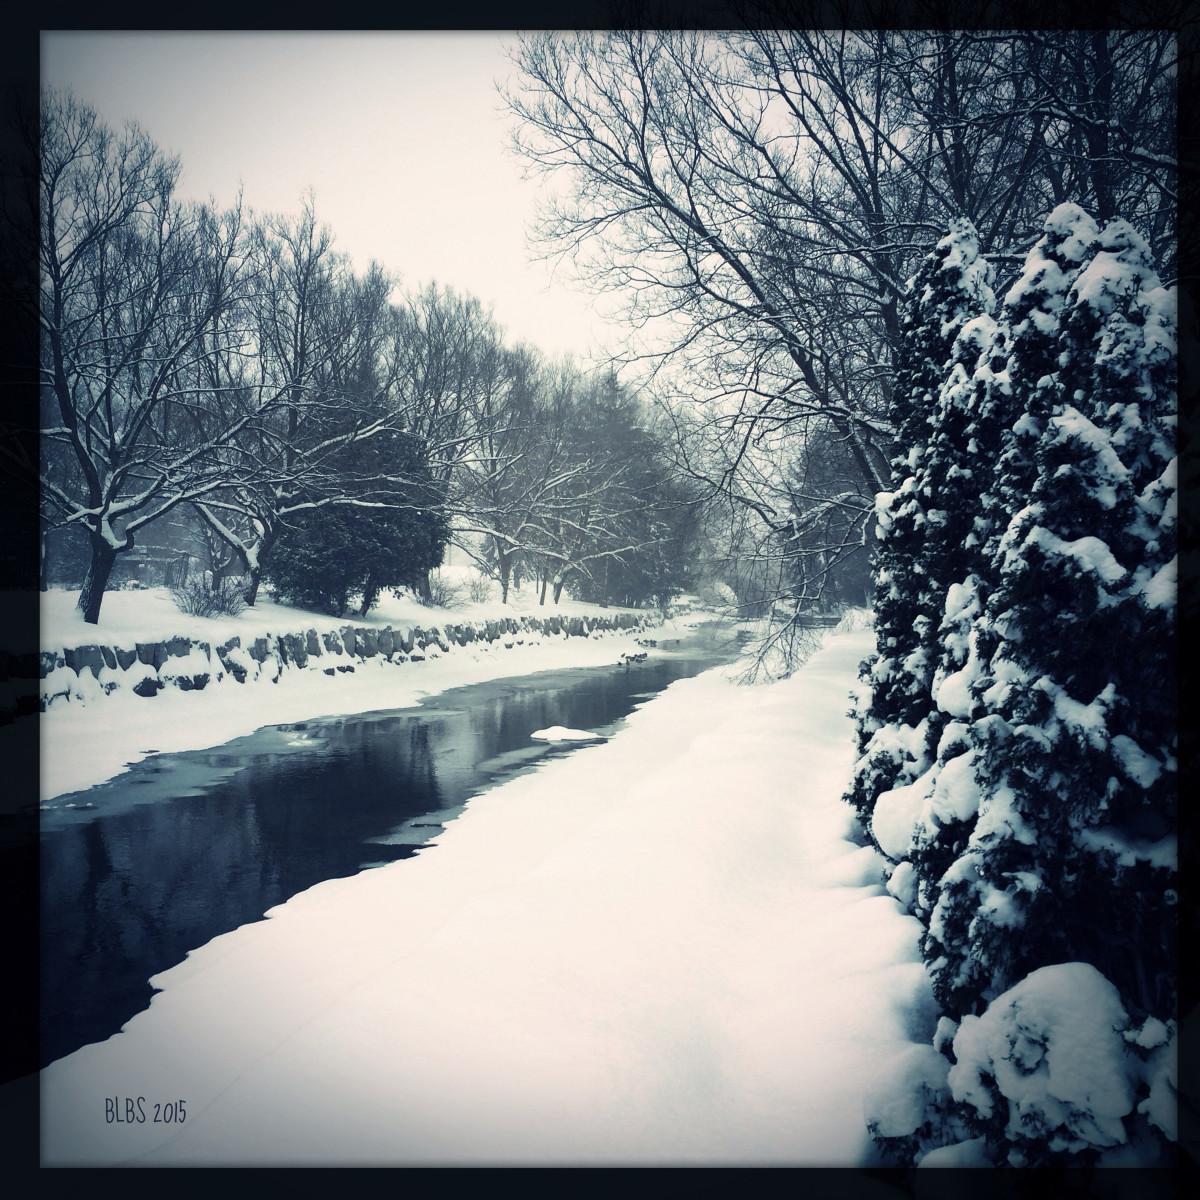 Snowy River Bank